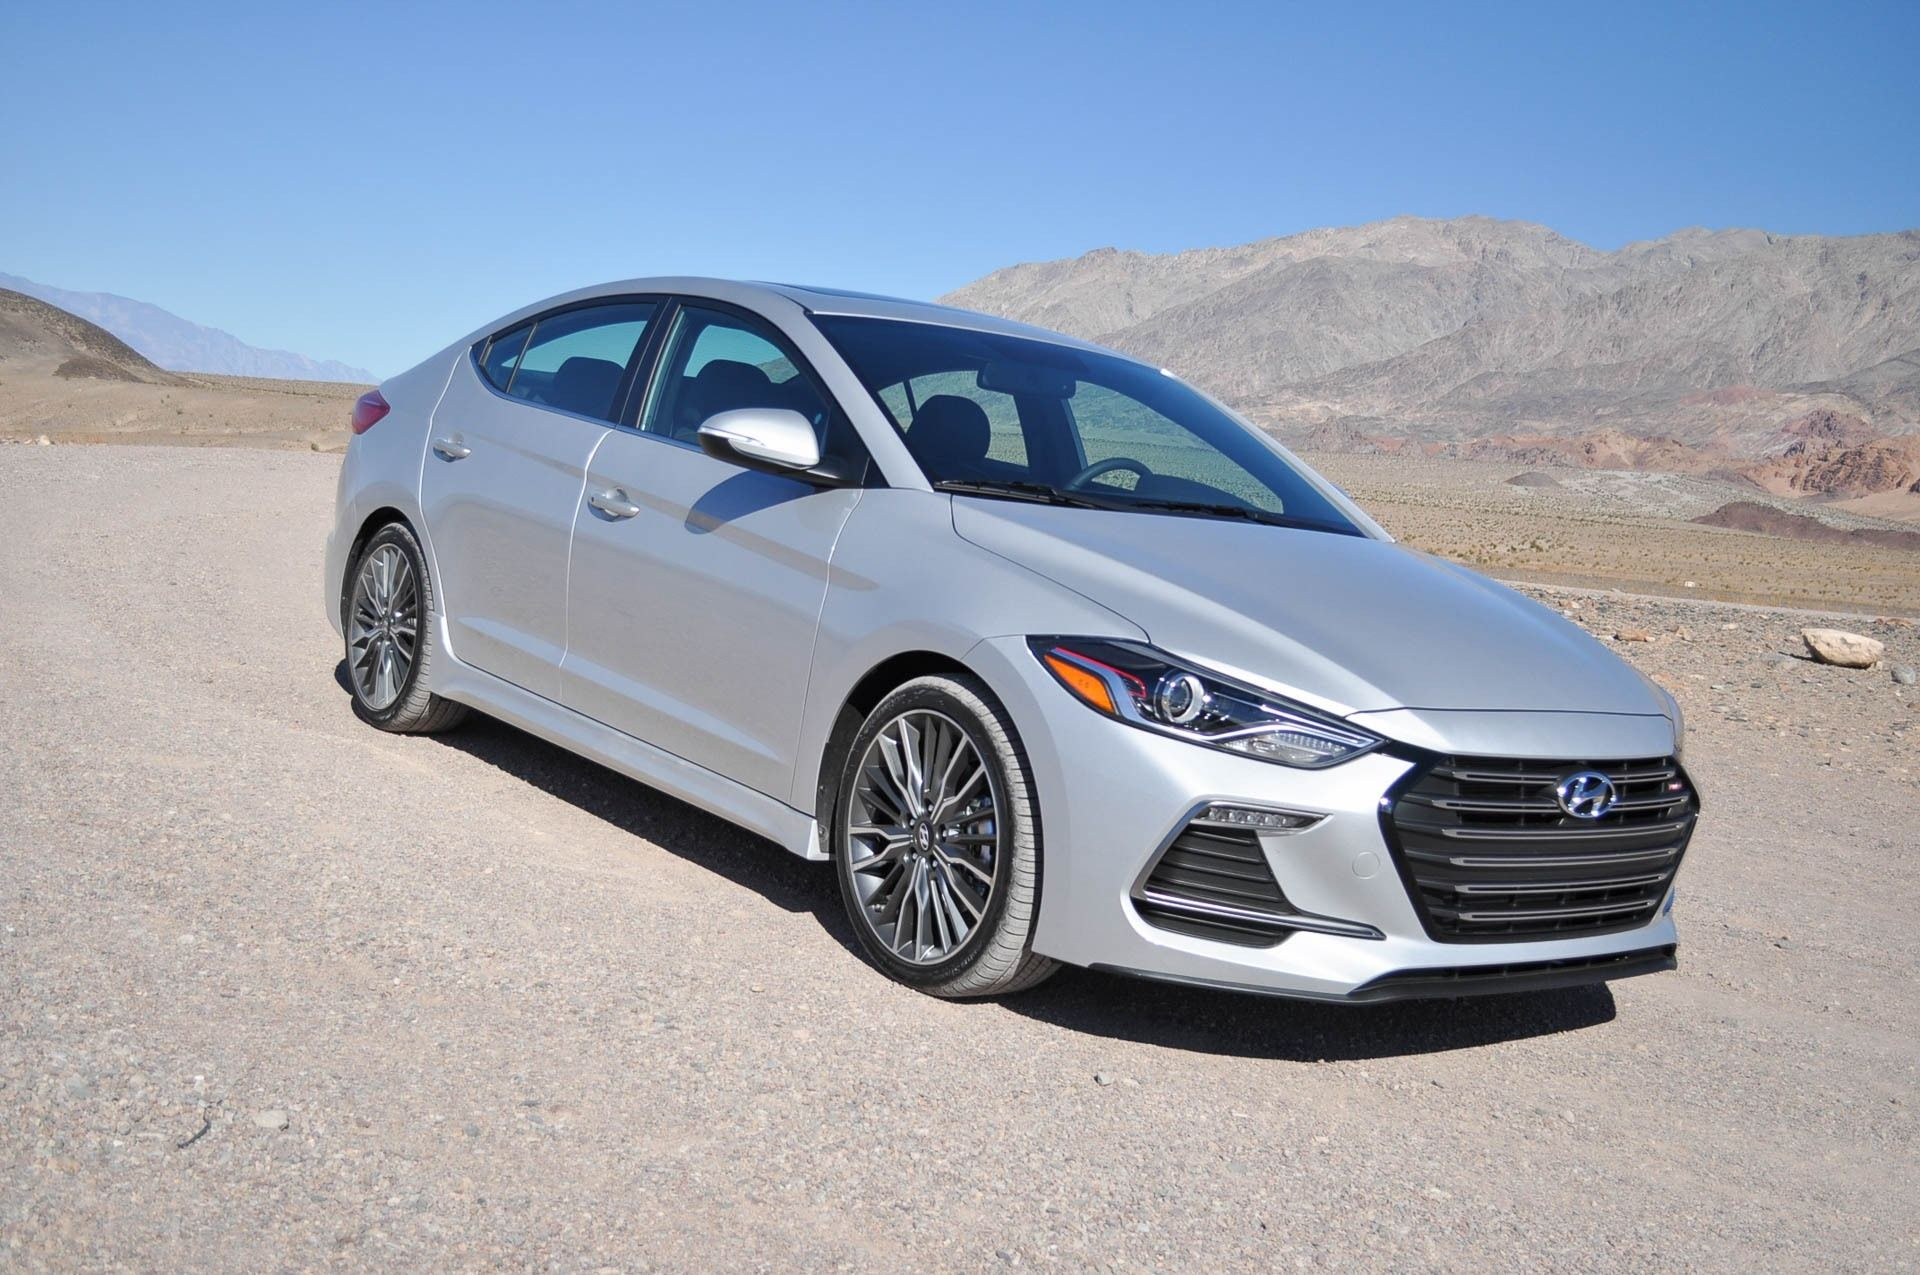 2019 Hyundai Elantra Sport Manual Redesign Price And Review Hyundai Elantra Elantra Hyundai